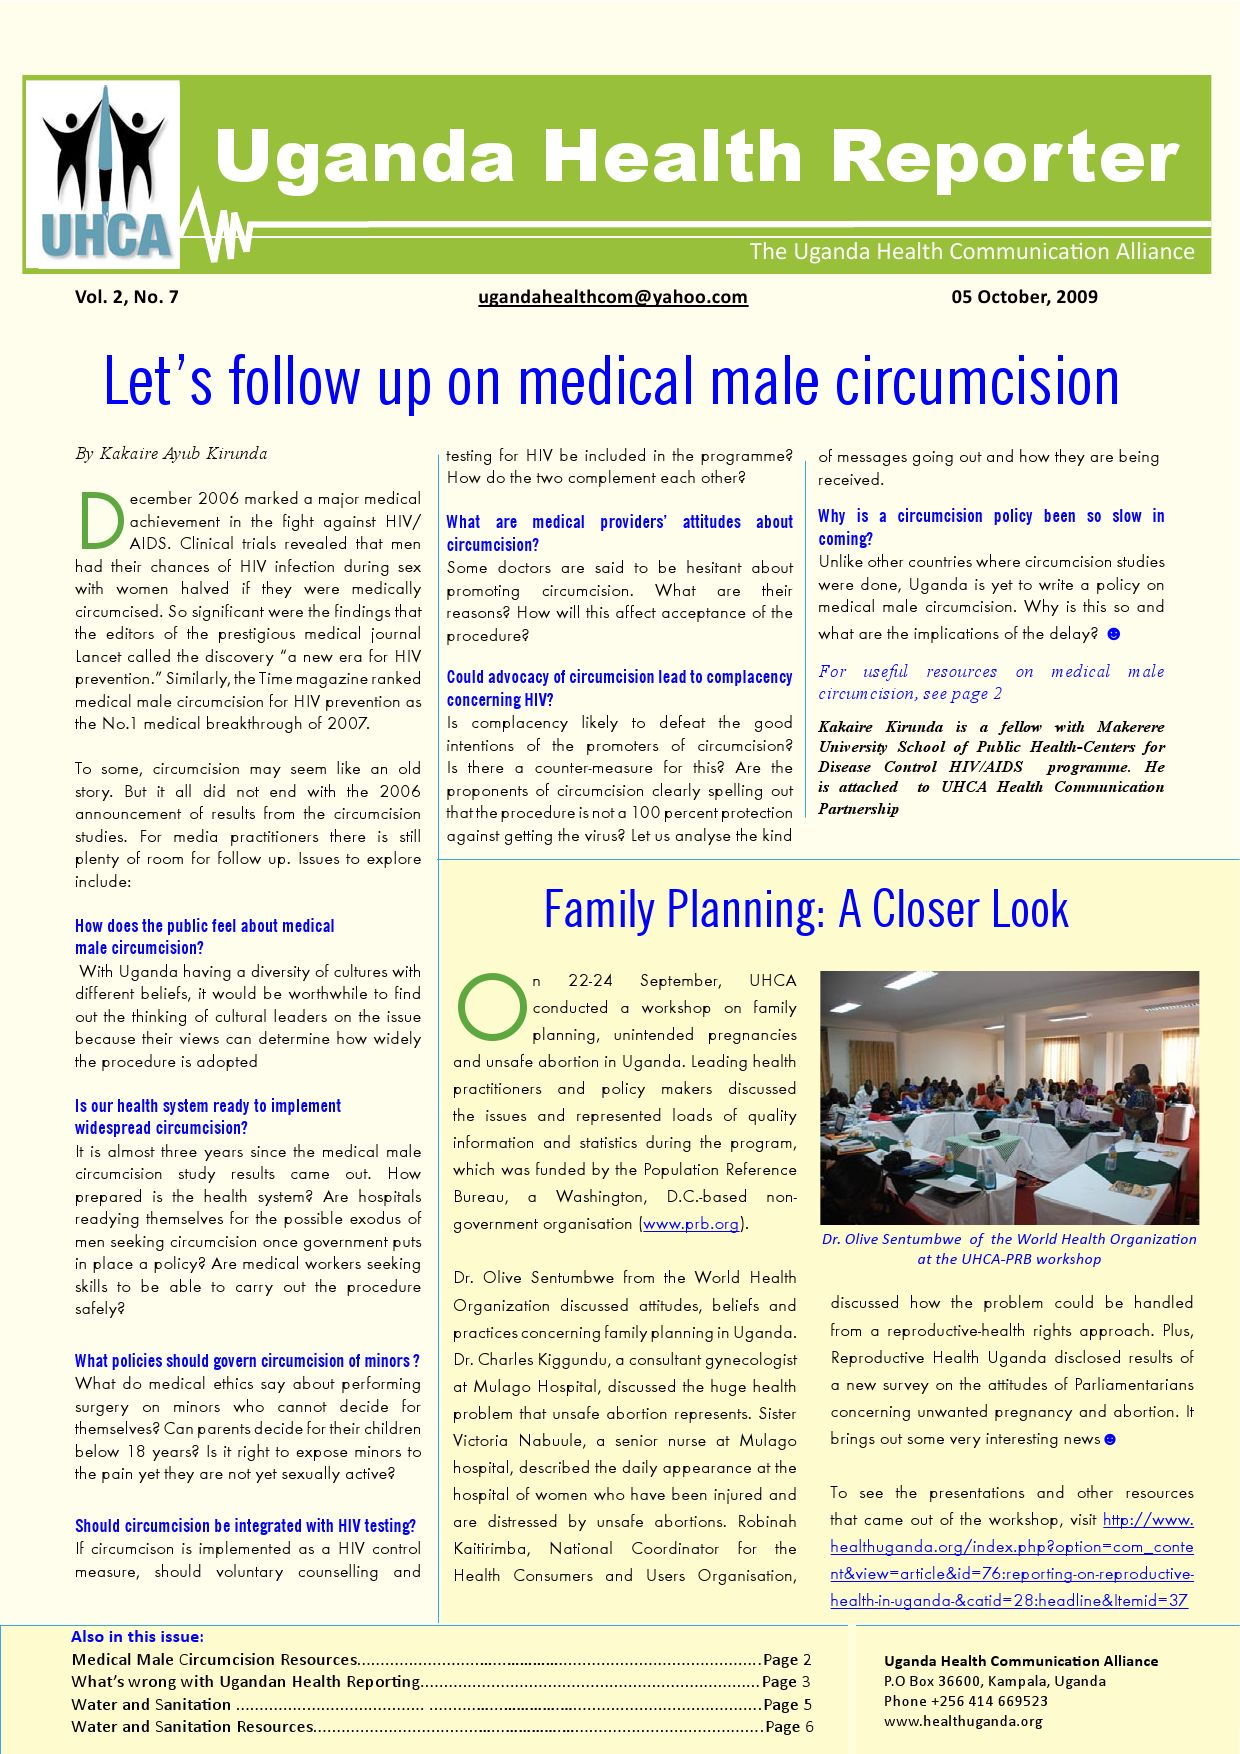 Uganda Health Reporter Newsletter: Vol  2 No  7 by Knight